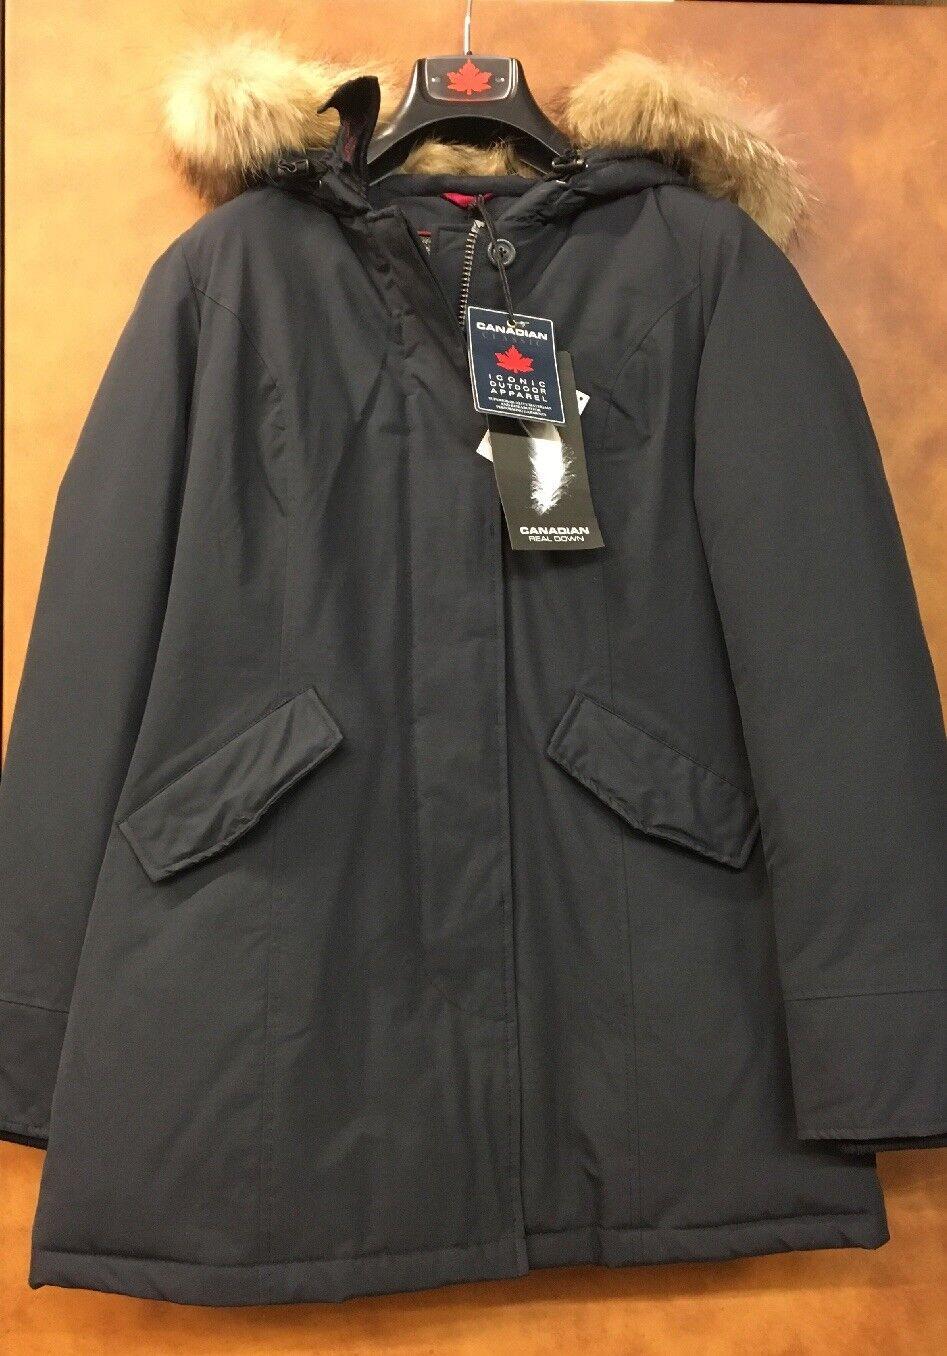 Canadian Classic señora plumón chaqueta  mujer   Navy GR  M L  neu350   sale  bienvenido a elegir